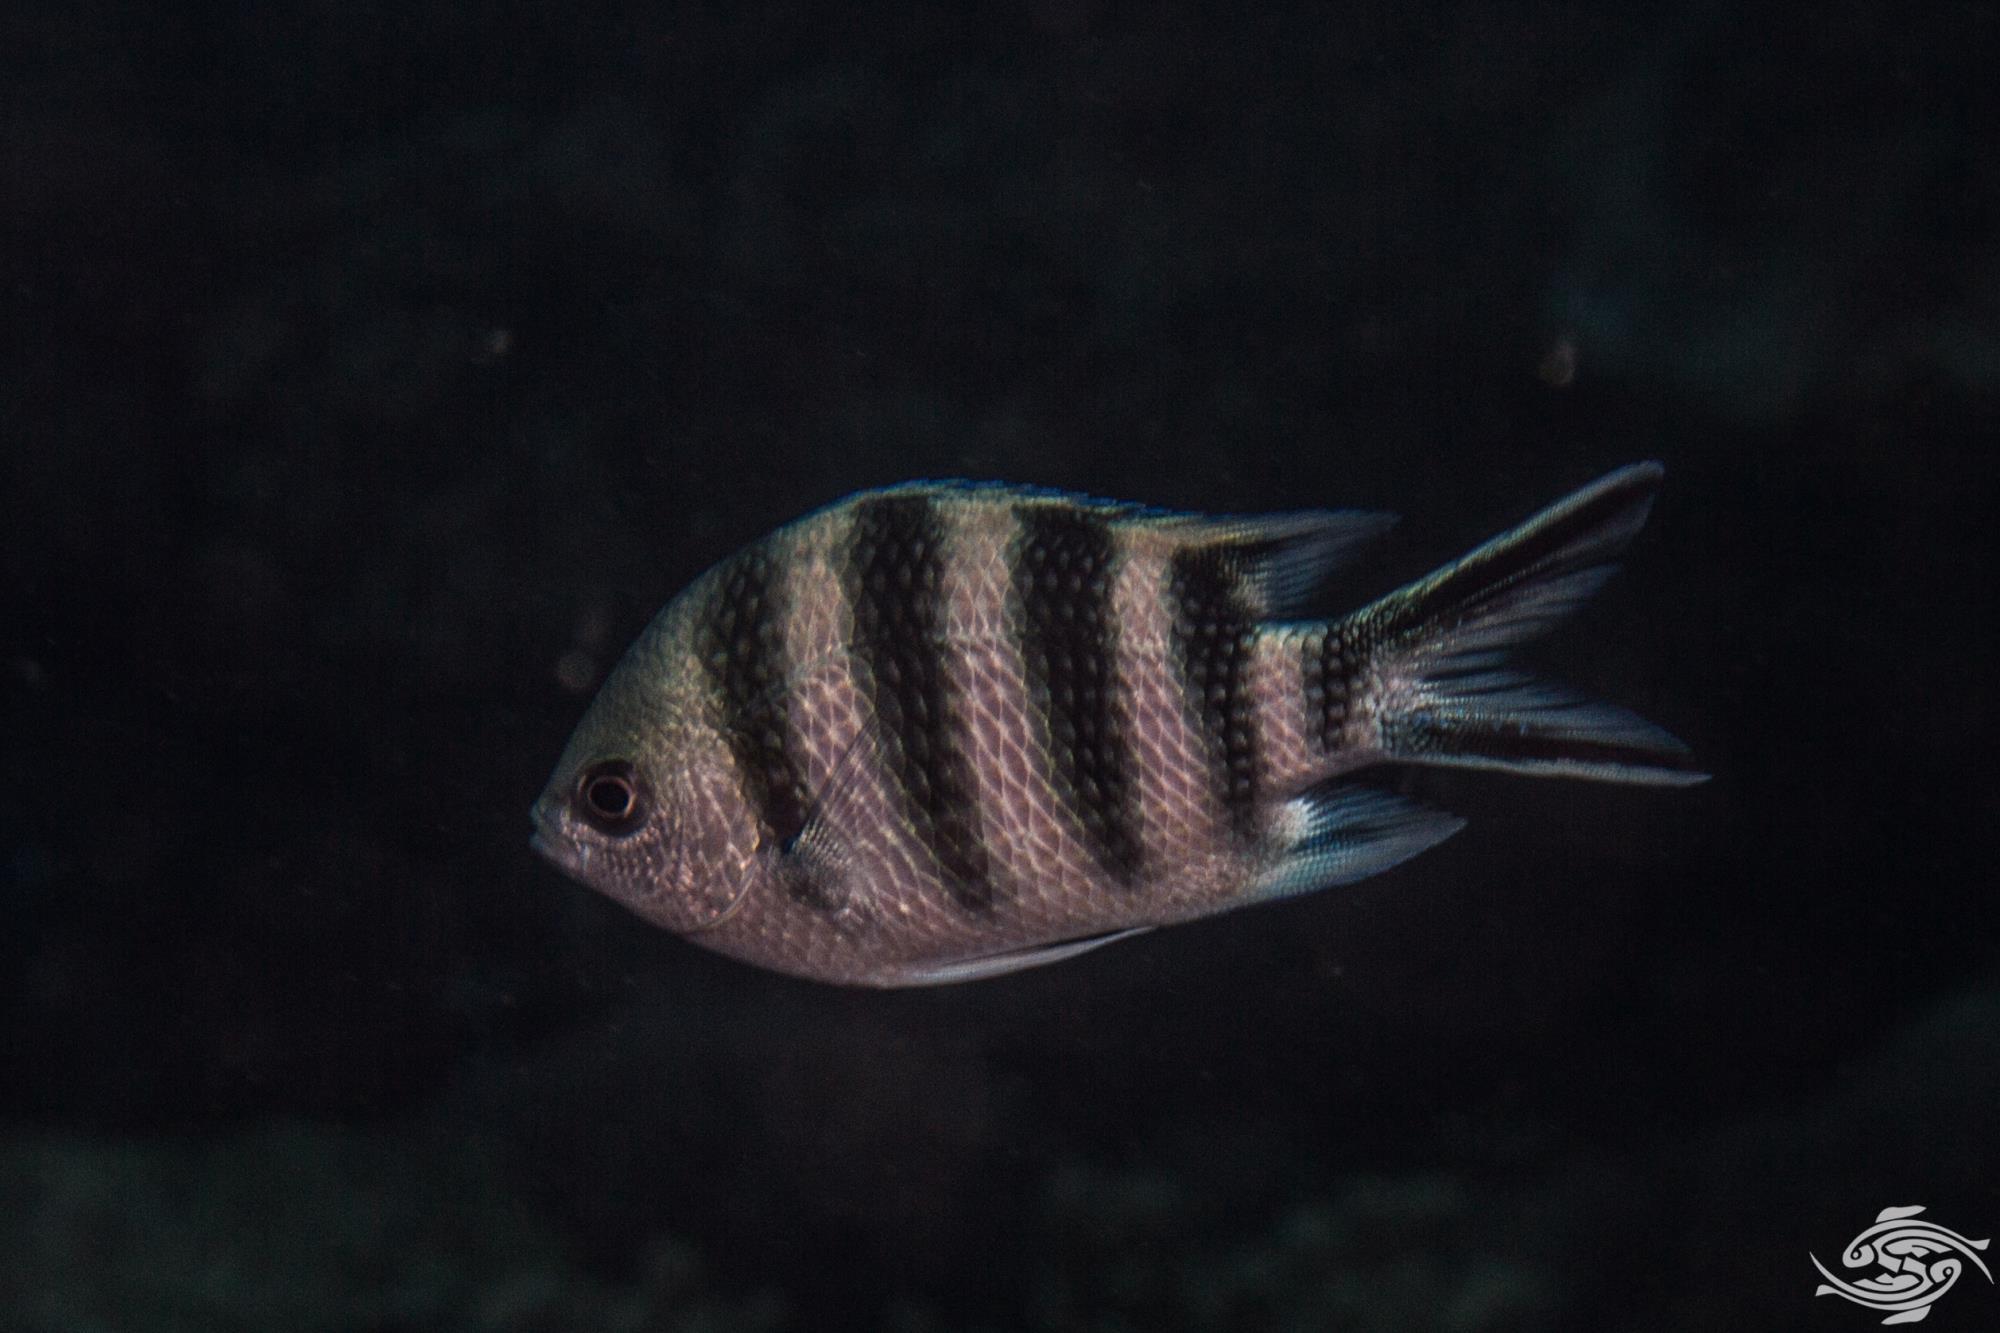 Scissortail Sergeant (Abudefduf sexfasciatus) also known as the striptailed damselfish